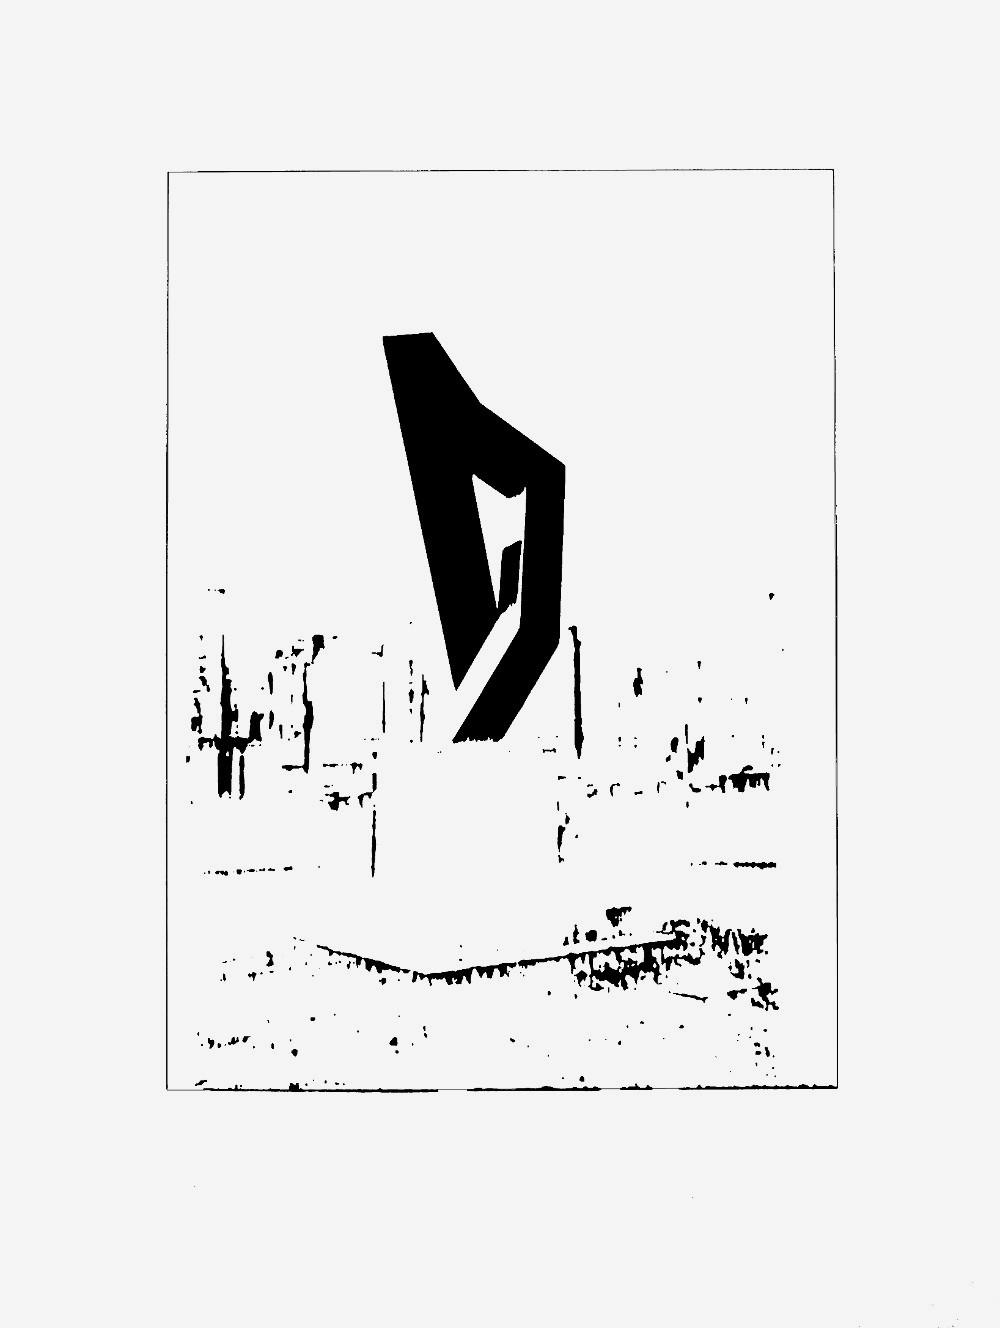 9-November-1989 Siebdruck